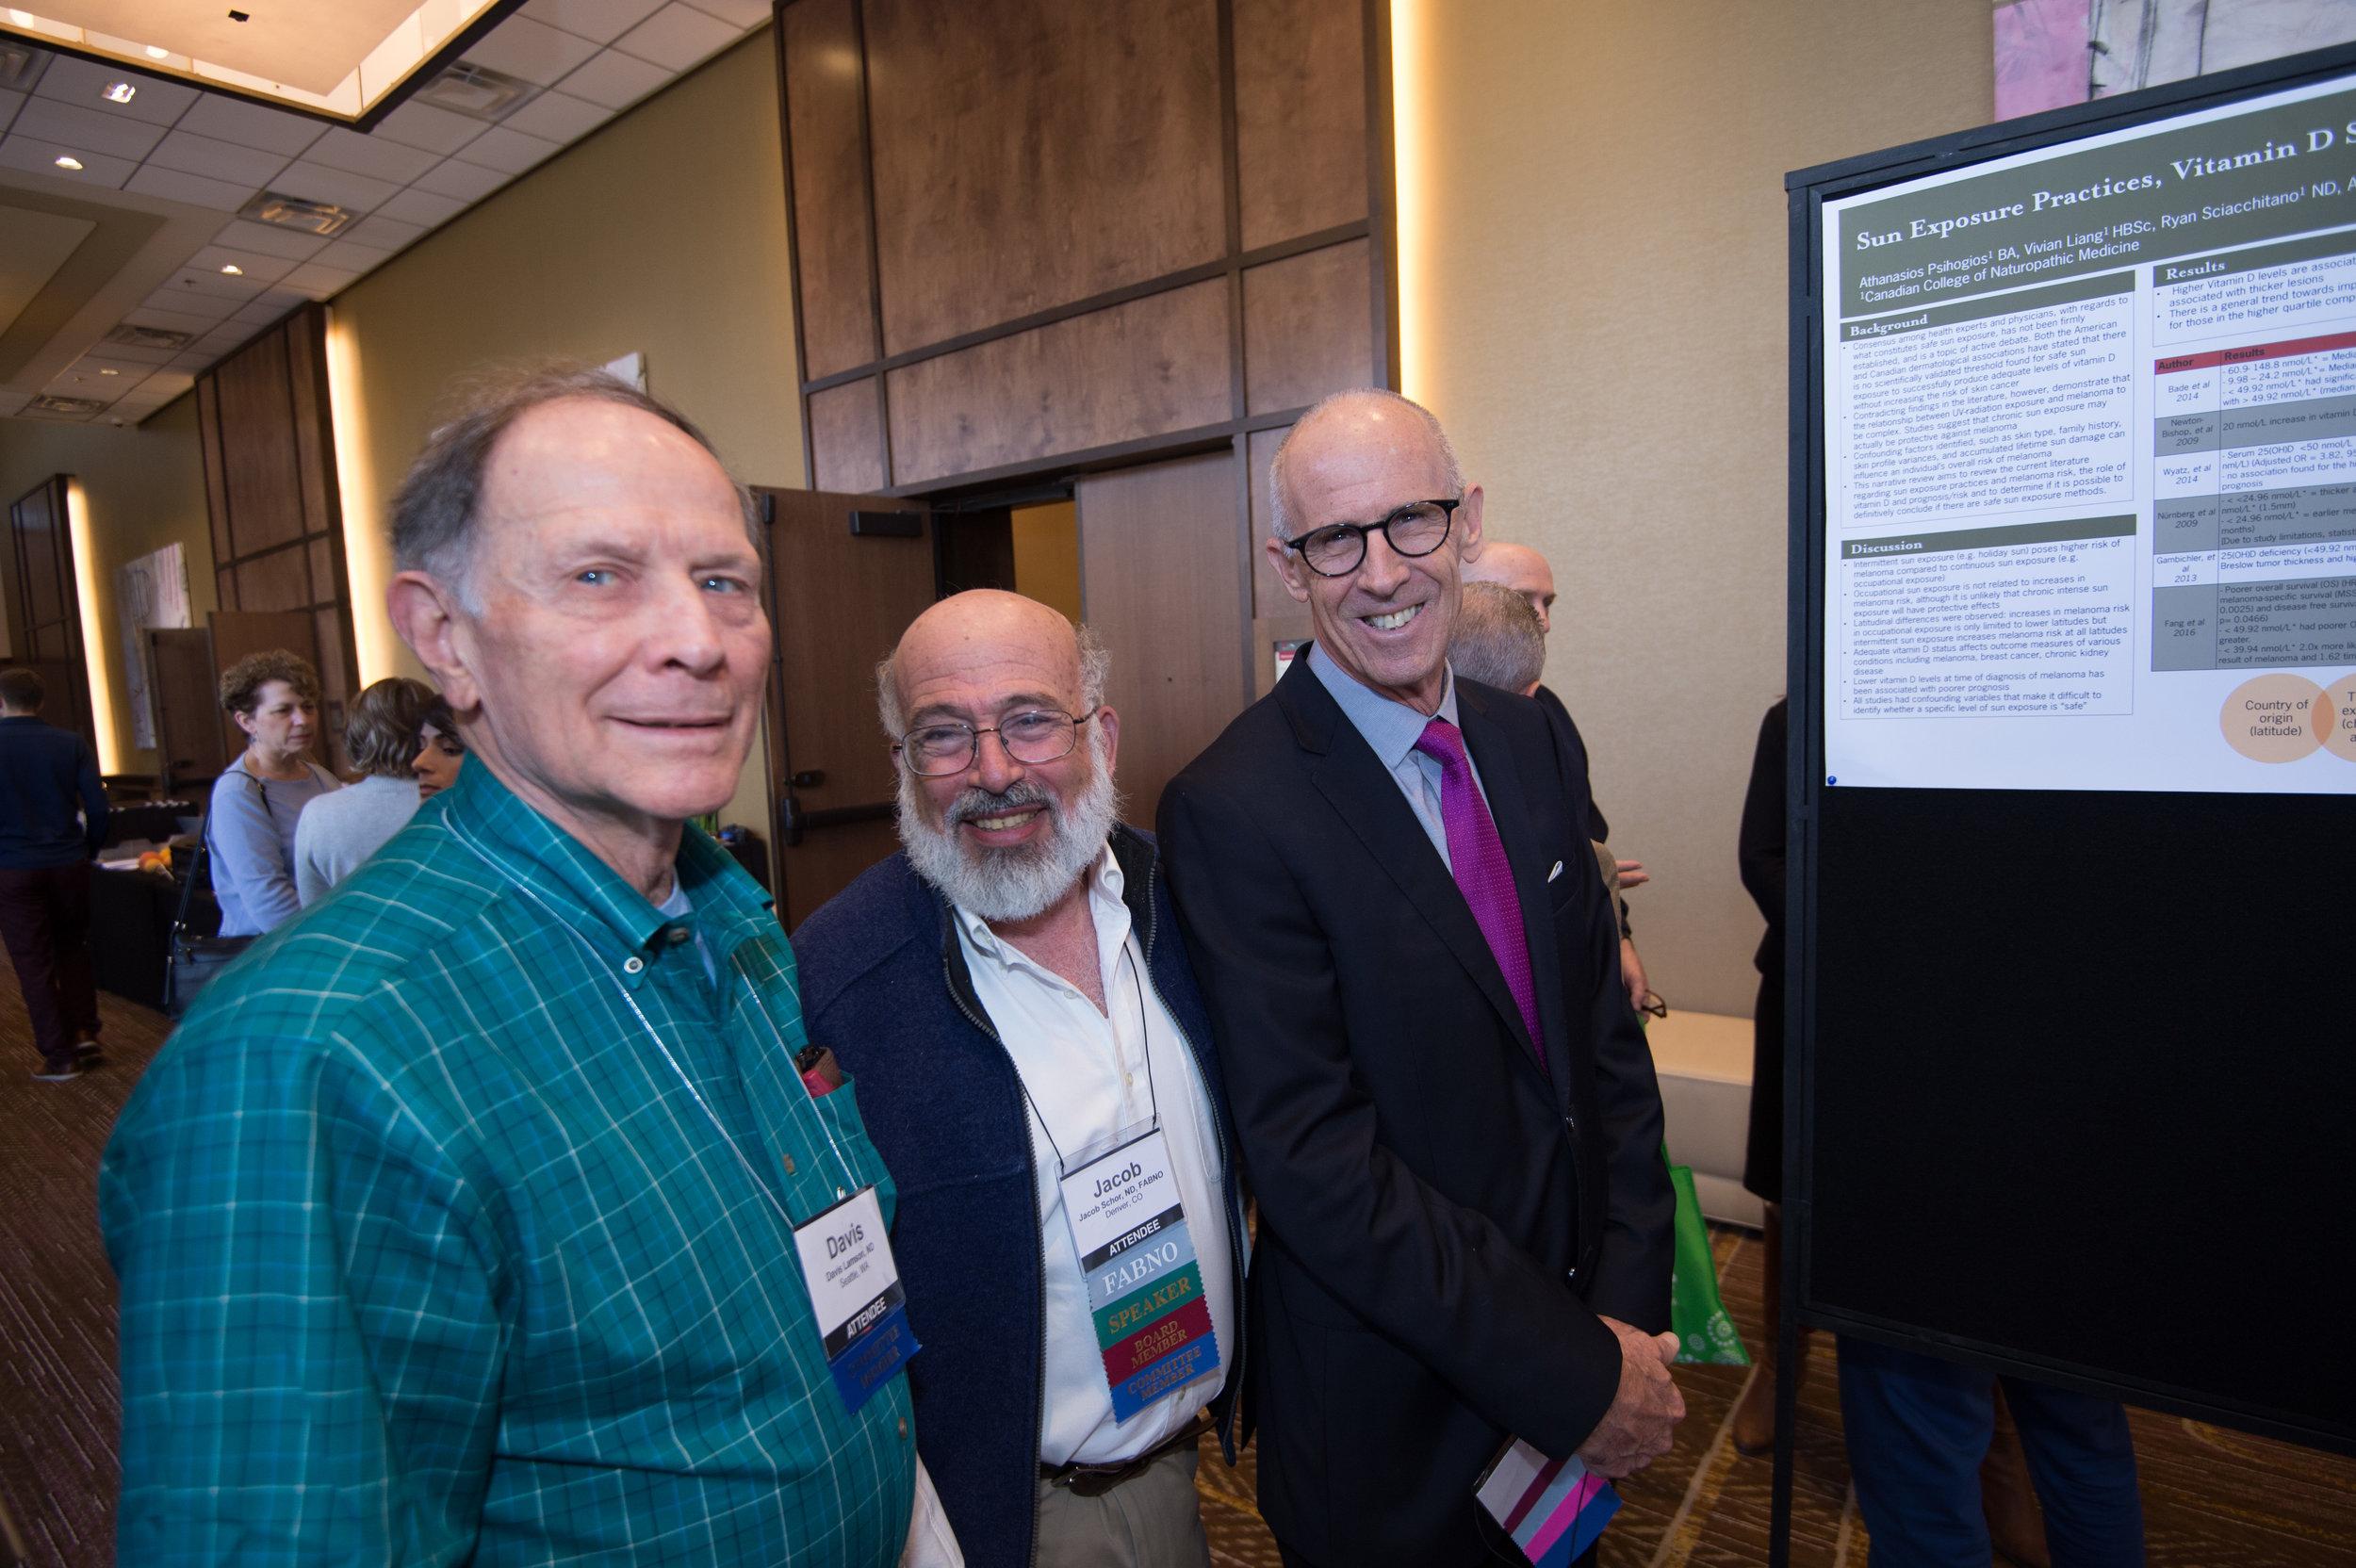 Longtime OncANP Members: Davis Lamson, Jacob Schor and Michael Traub